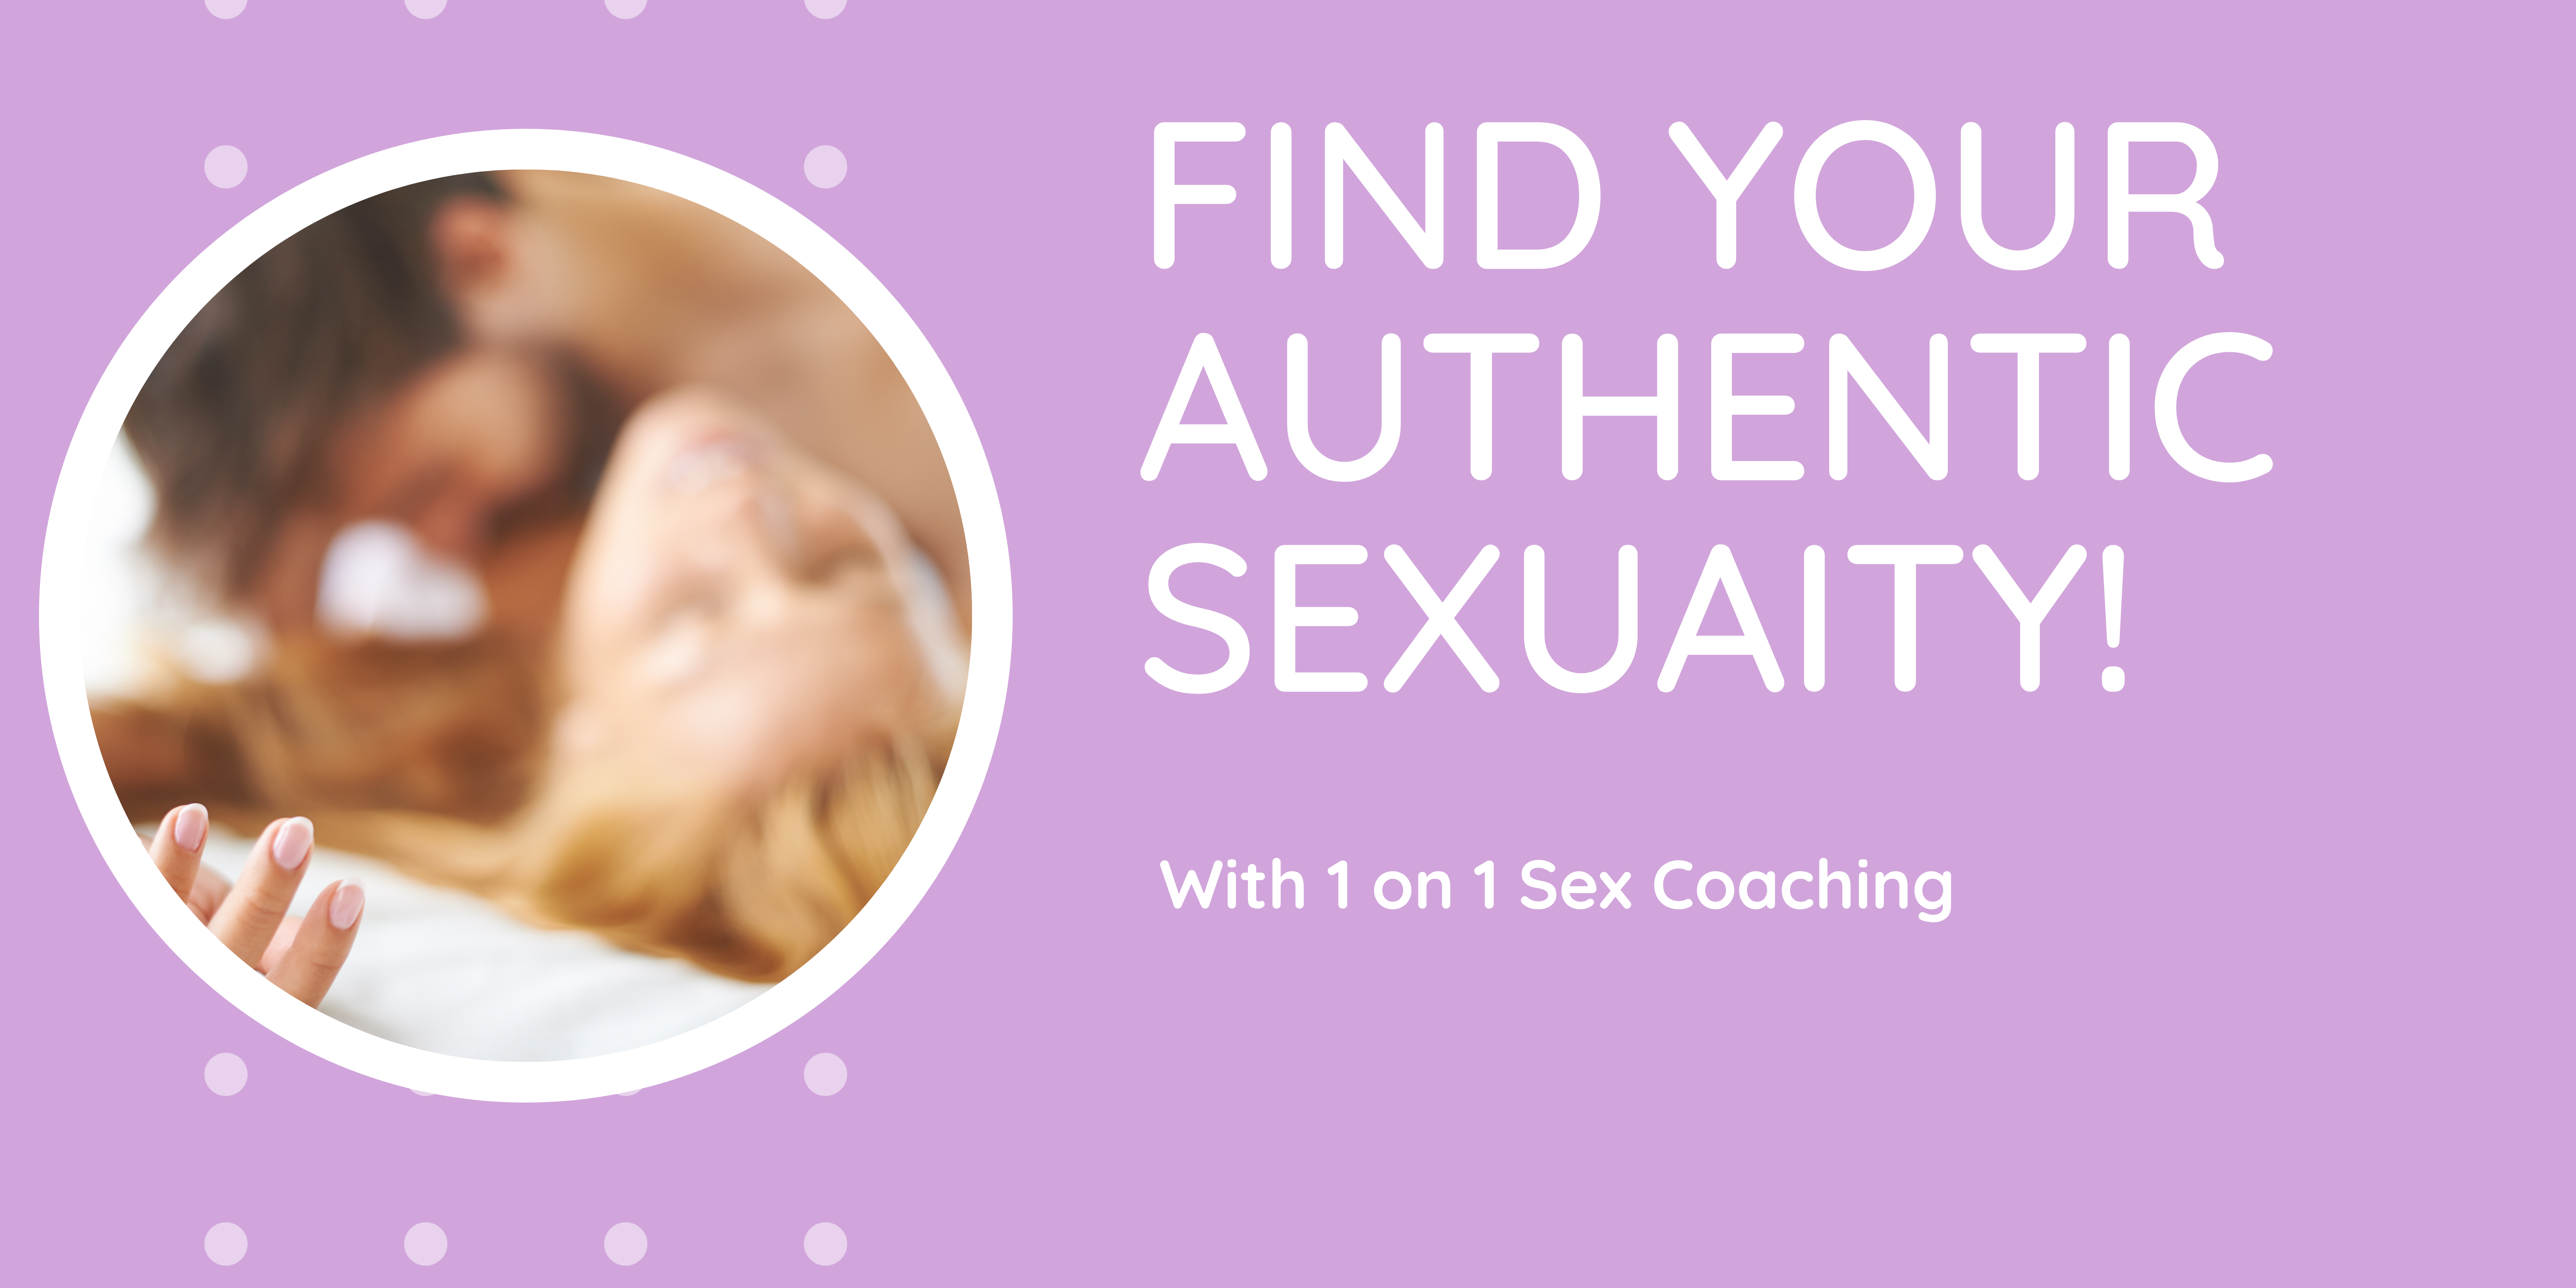 1 on 1 sex coaching